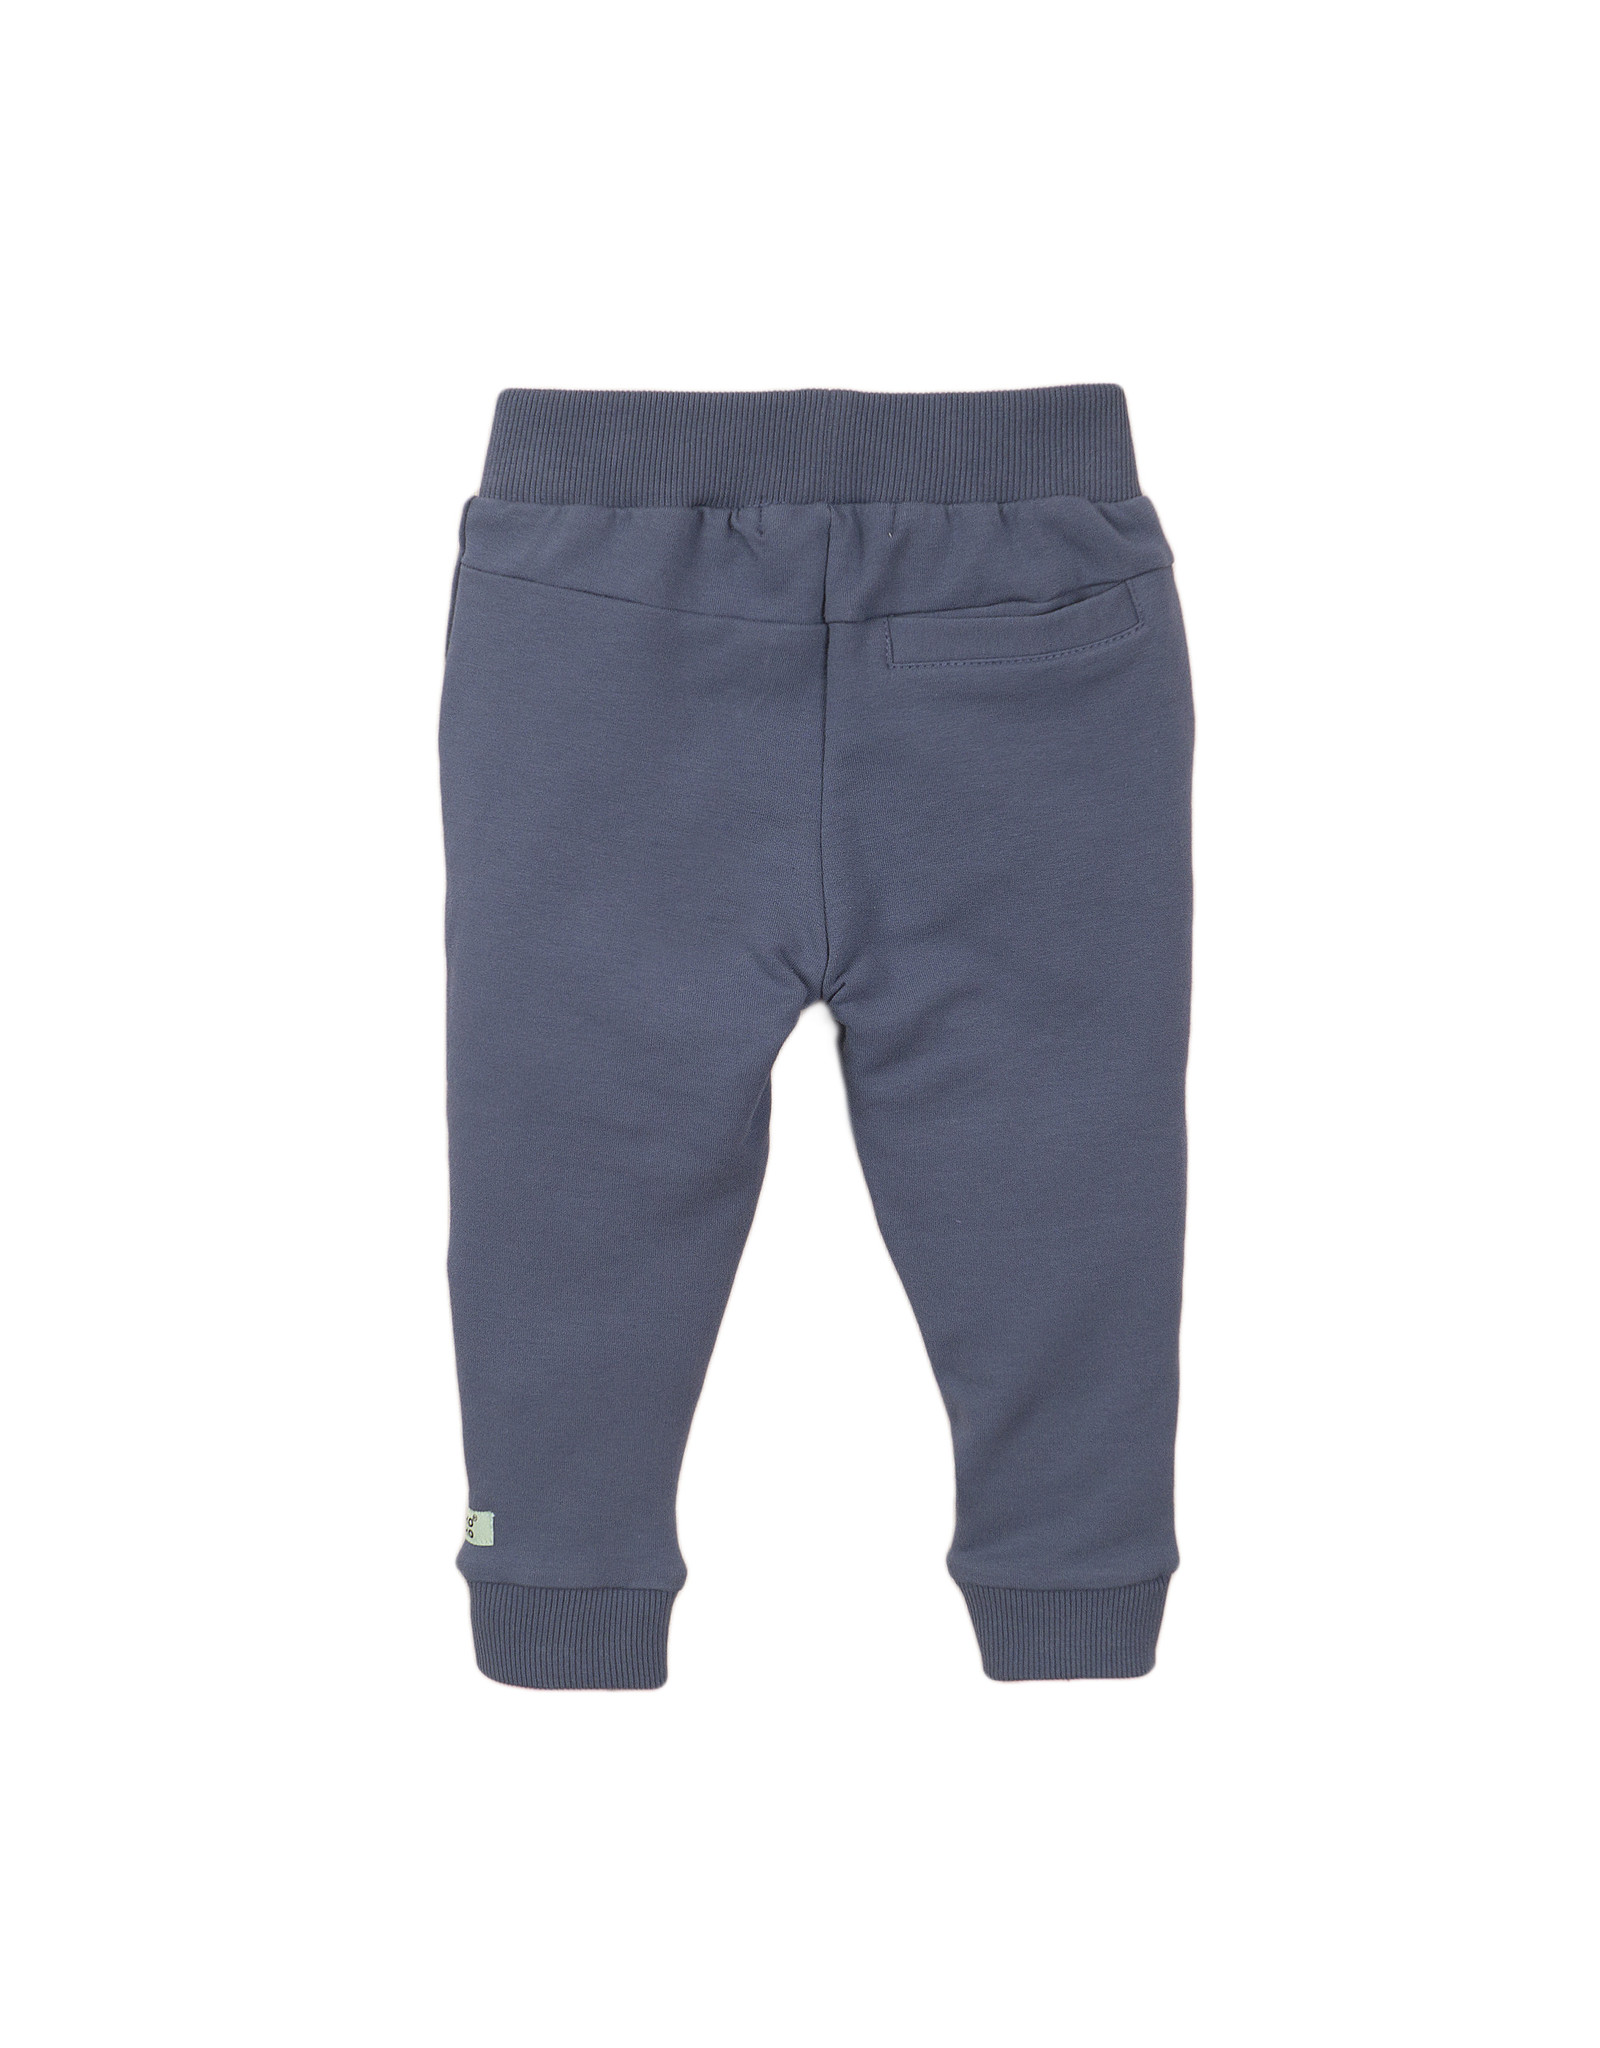 Koko Noko Boys Jogging trousers mid blue